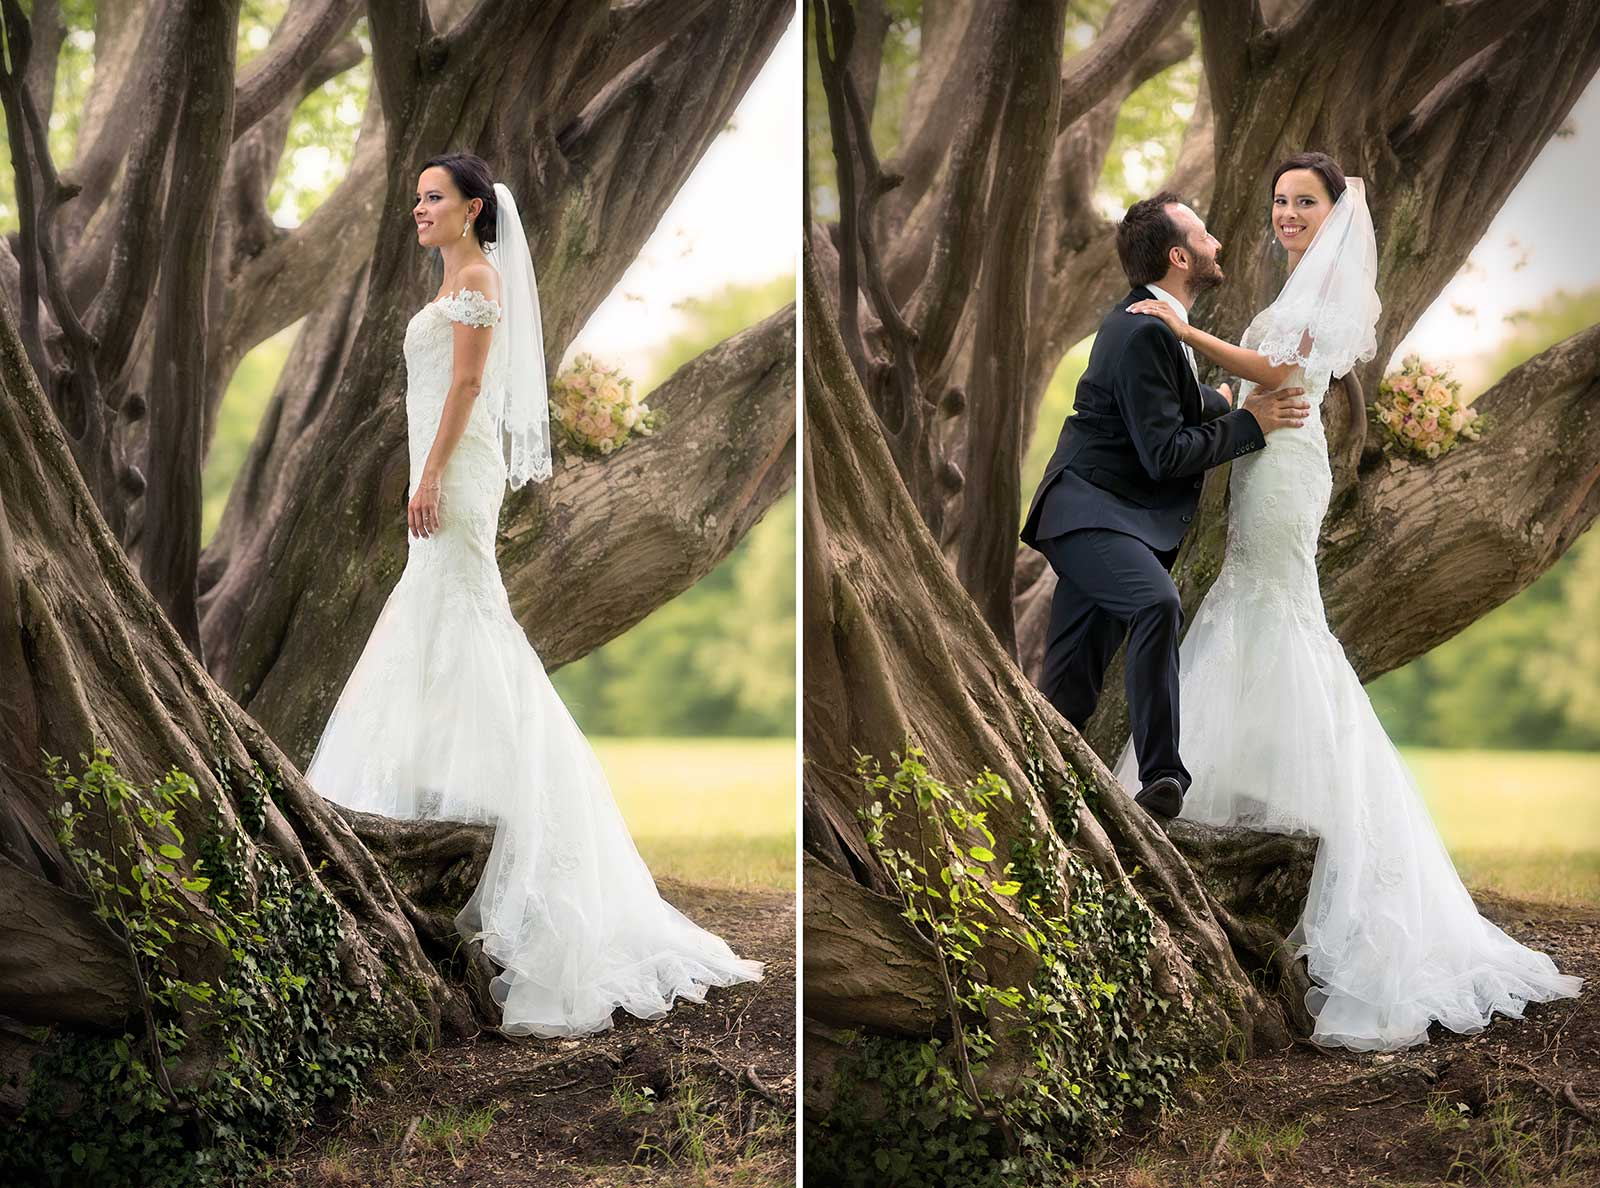 12 svatebni foto nevesta zenich u stromu jihocesky kraj